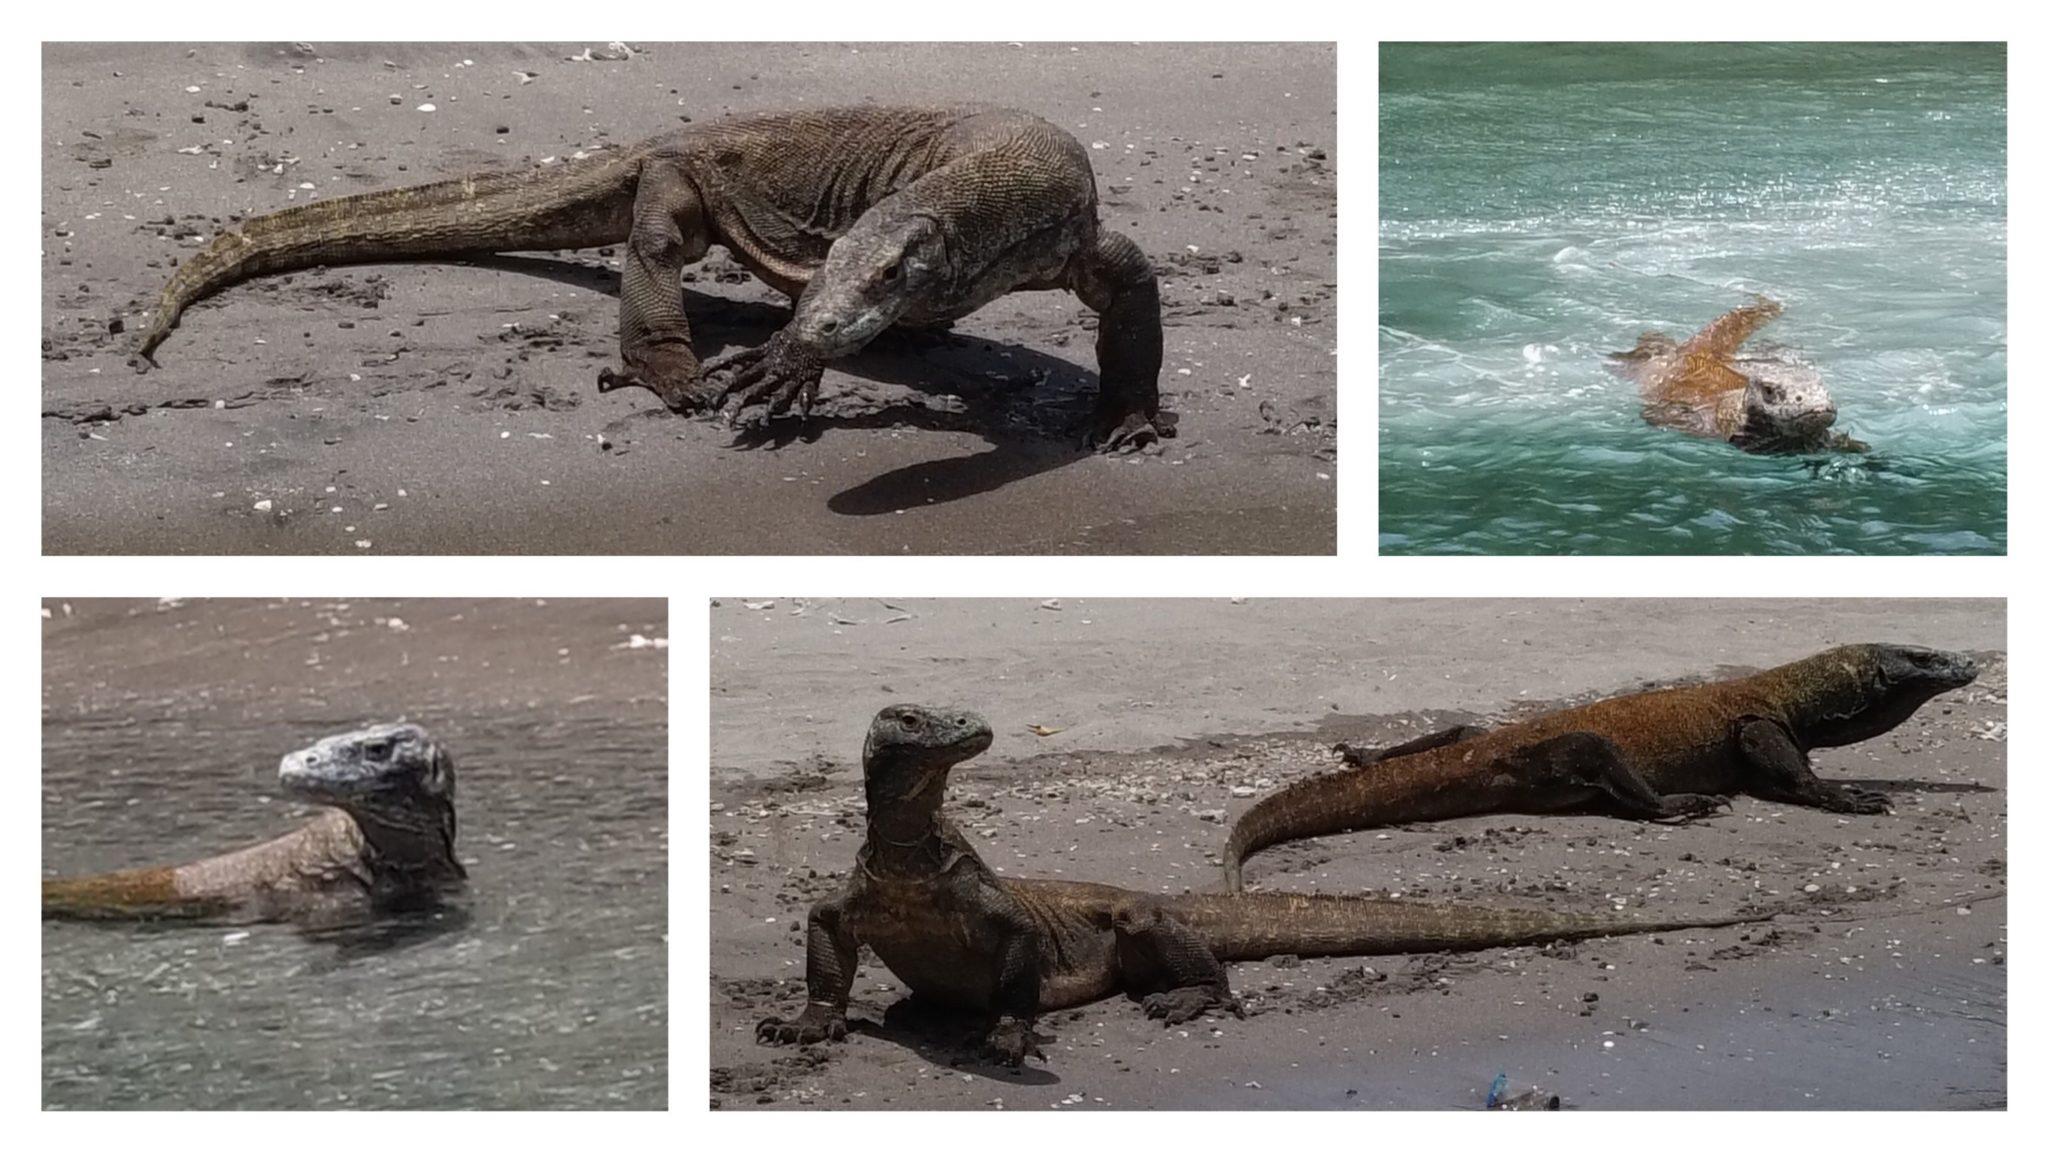 les dragons de komodo vus après la plongée